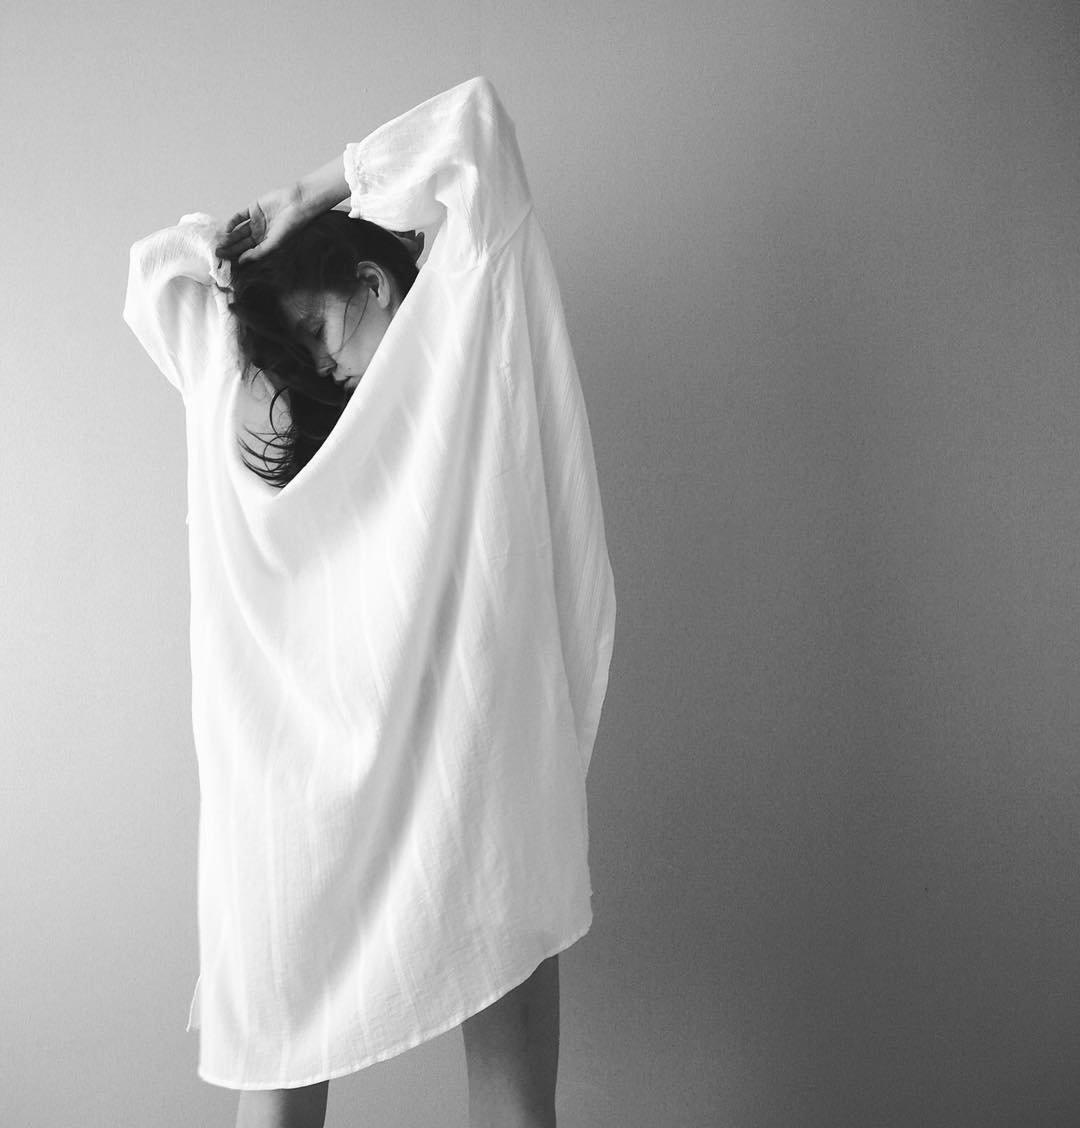 beautiful_black_and_white_portrait_photography_32.jpg